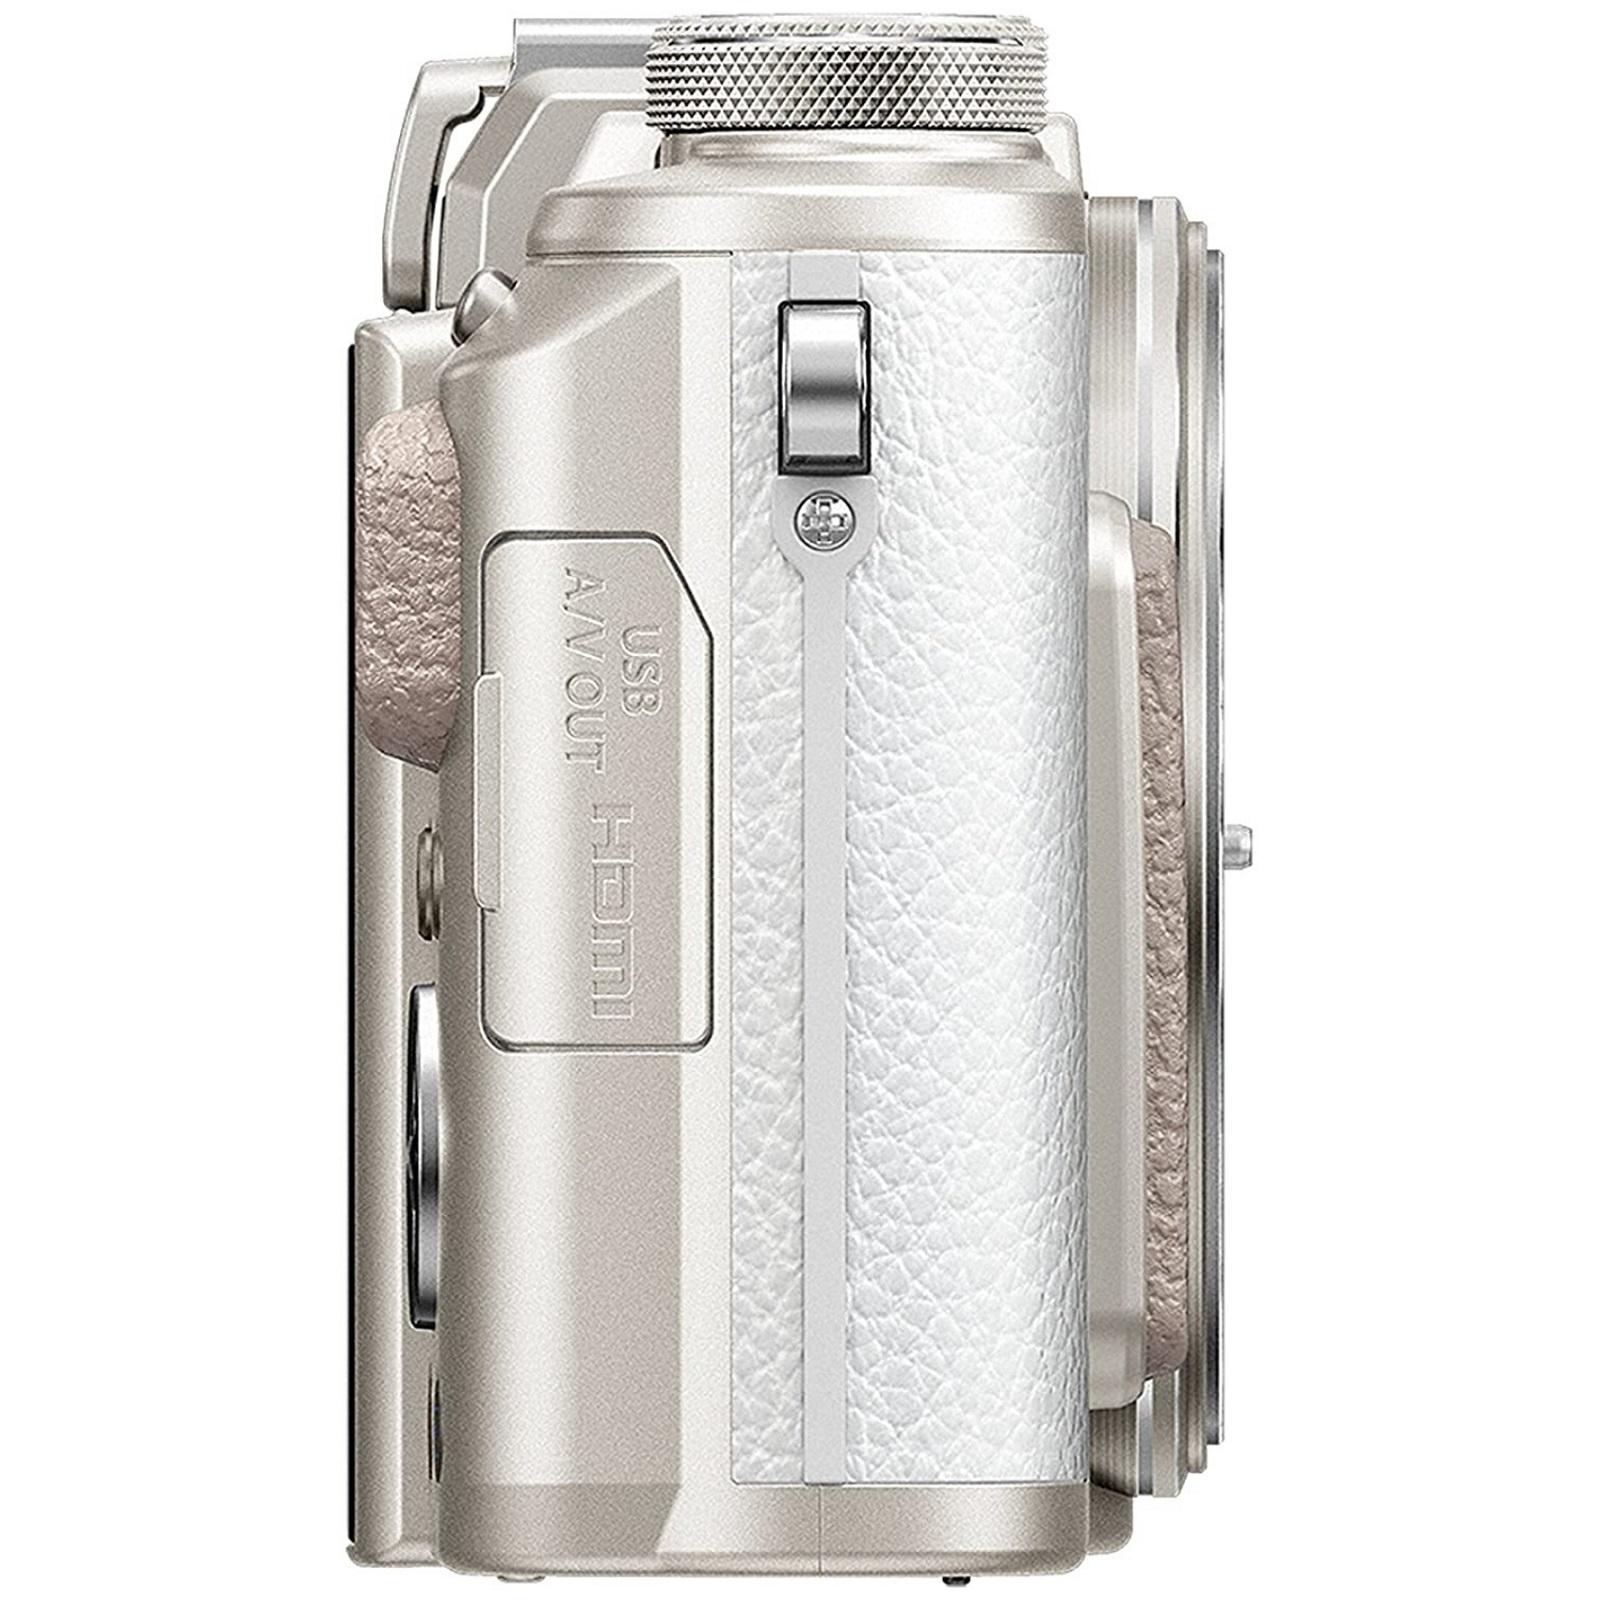 OLYMPUS オリンパス ミラーレス一眼カメラ PEN E-PL8 ボディ ホワイト 新品